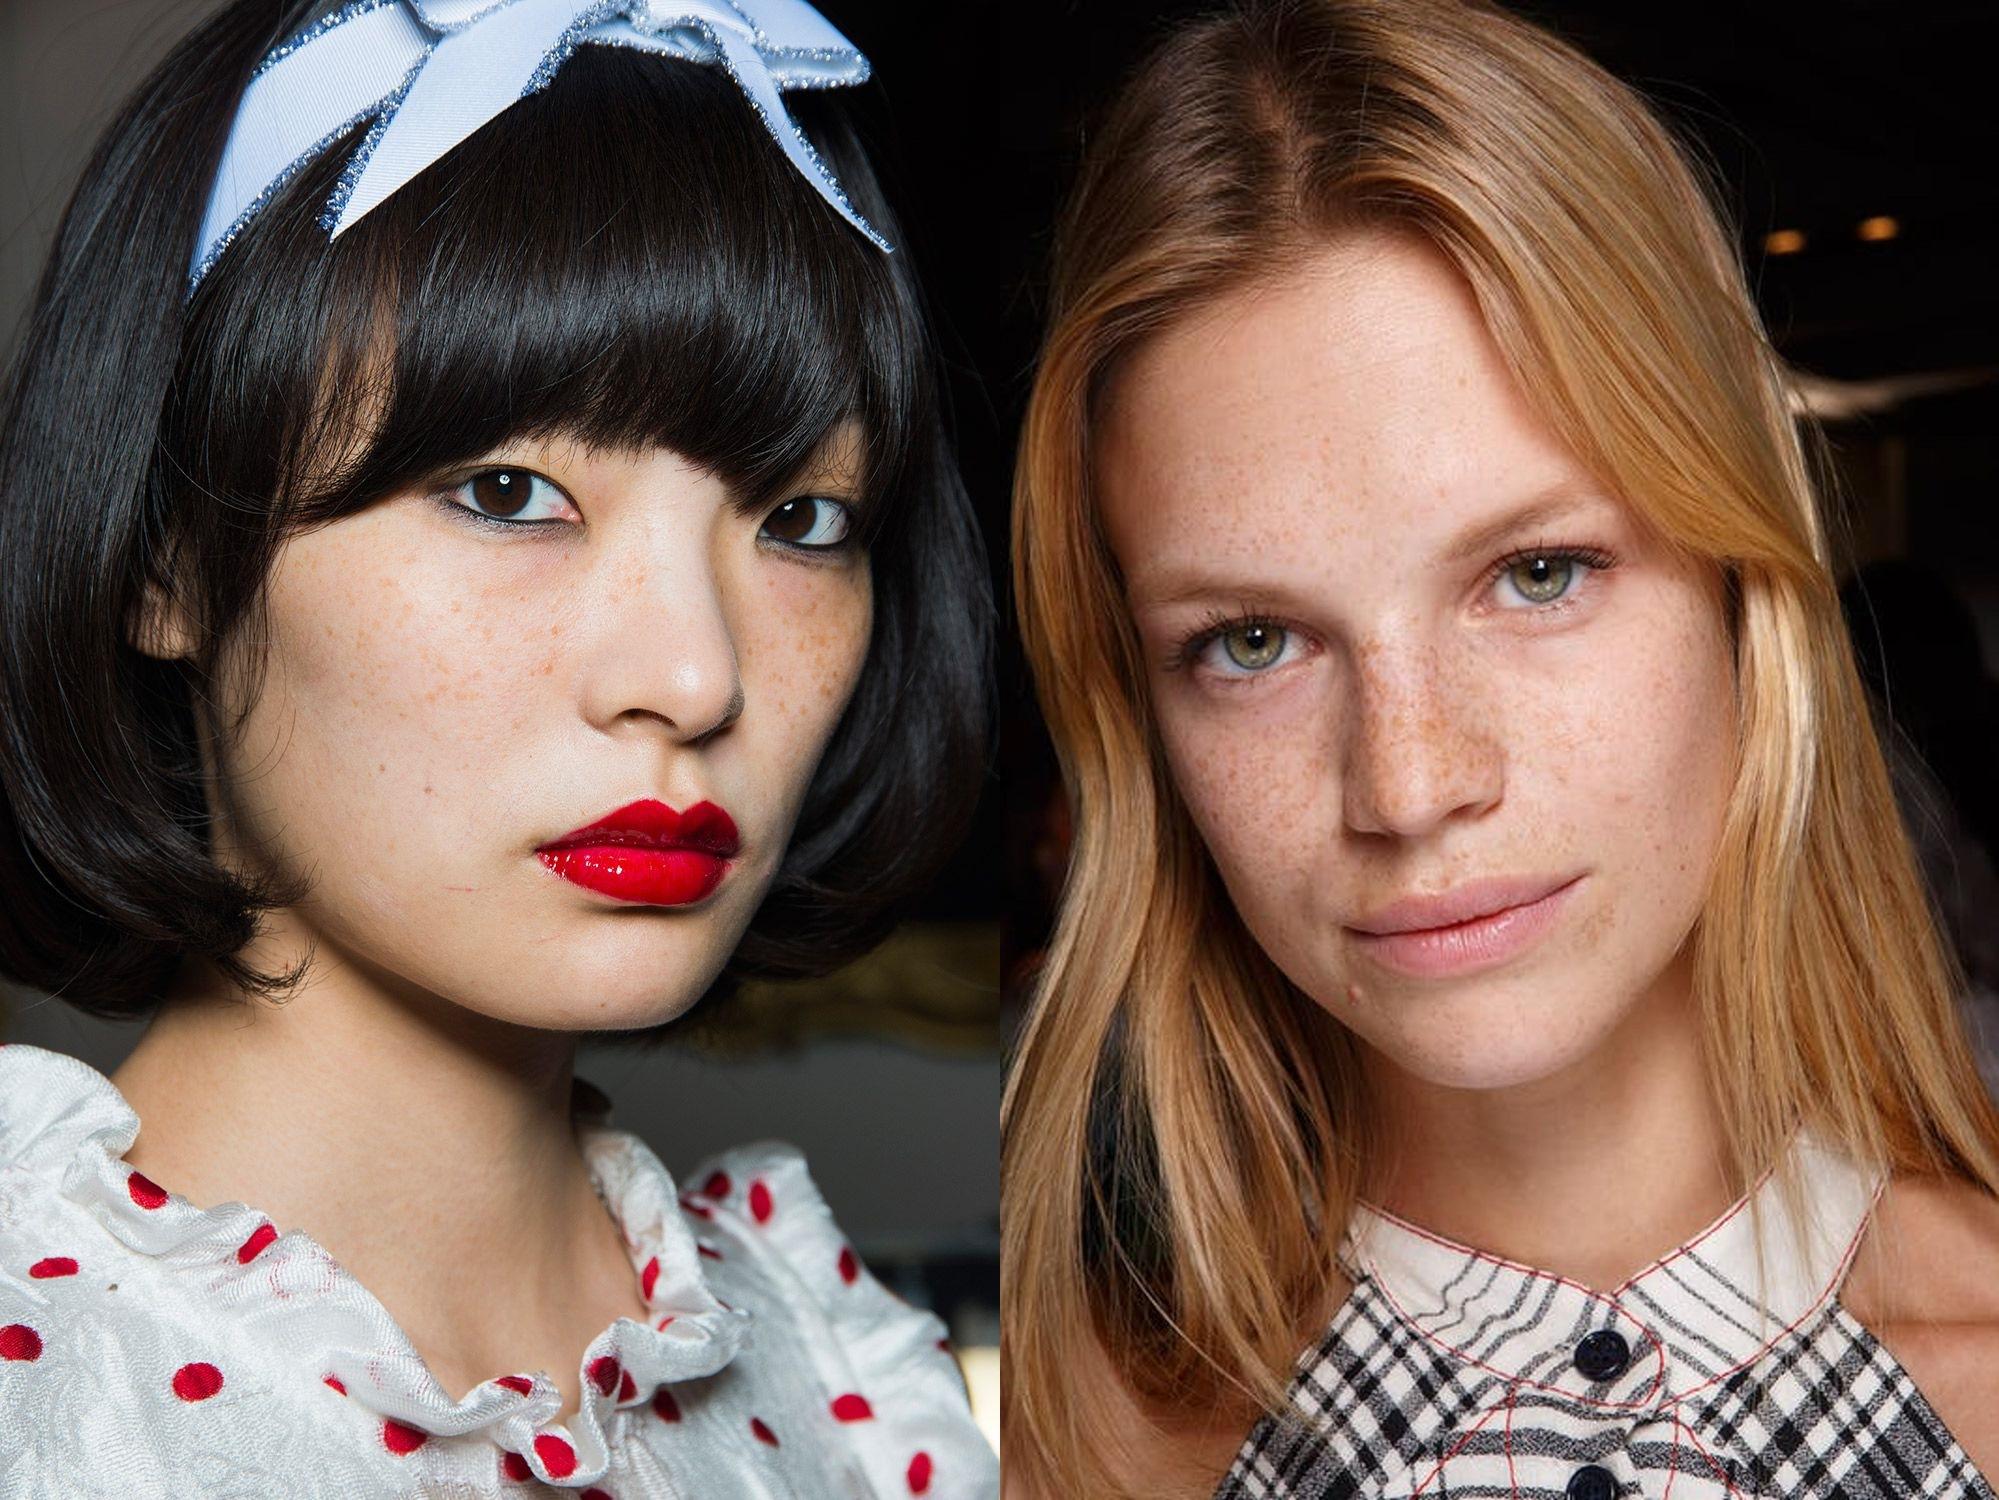 spring-summer-2019-makeup-trends-freckles-ryan-lo-imax-1538654992-horz.jpg